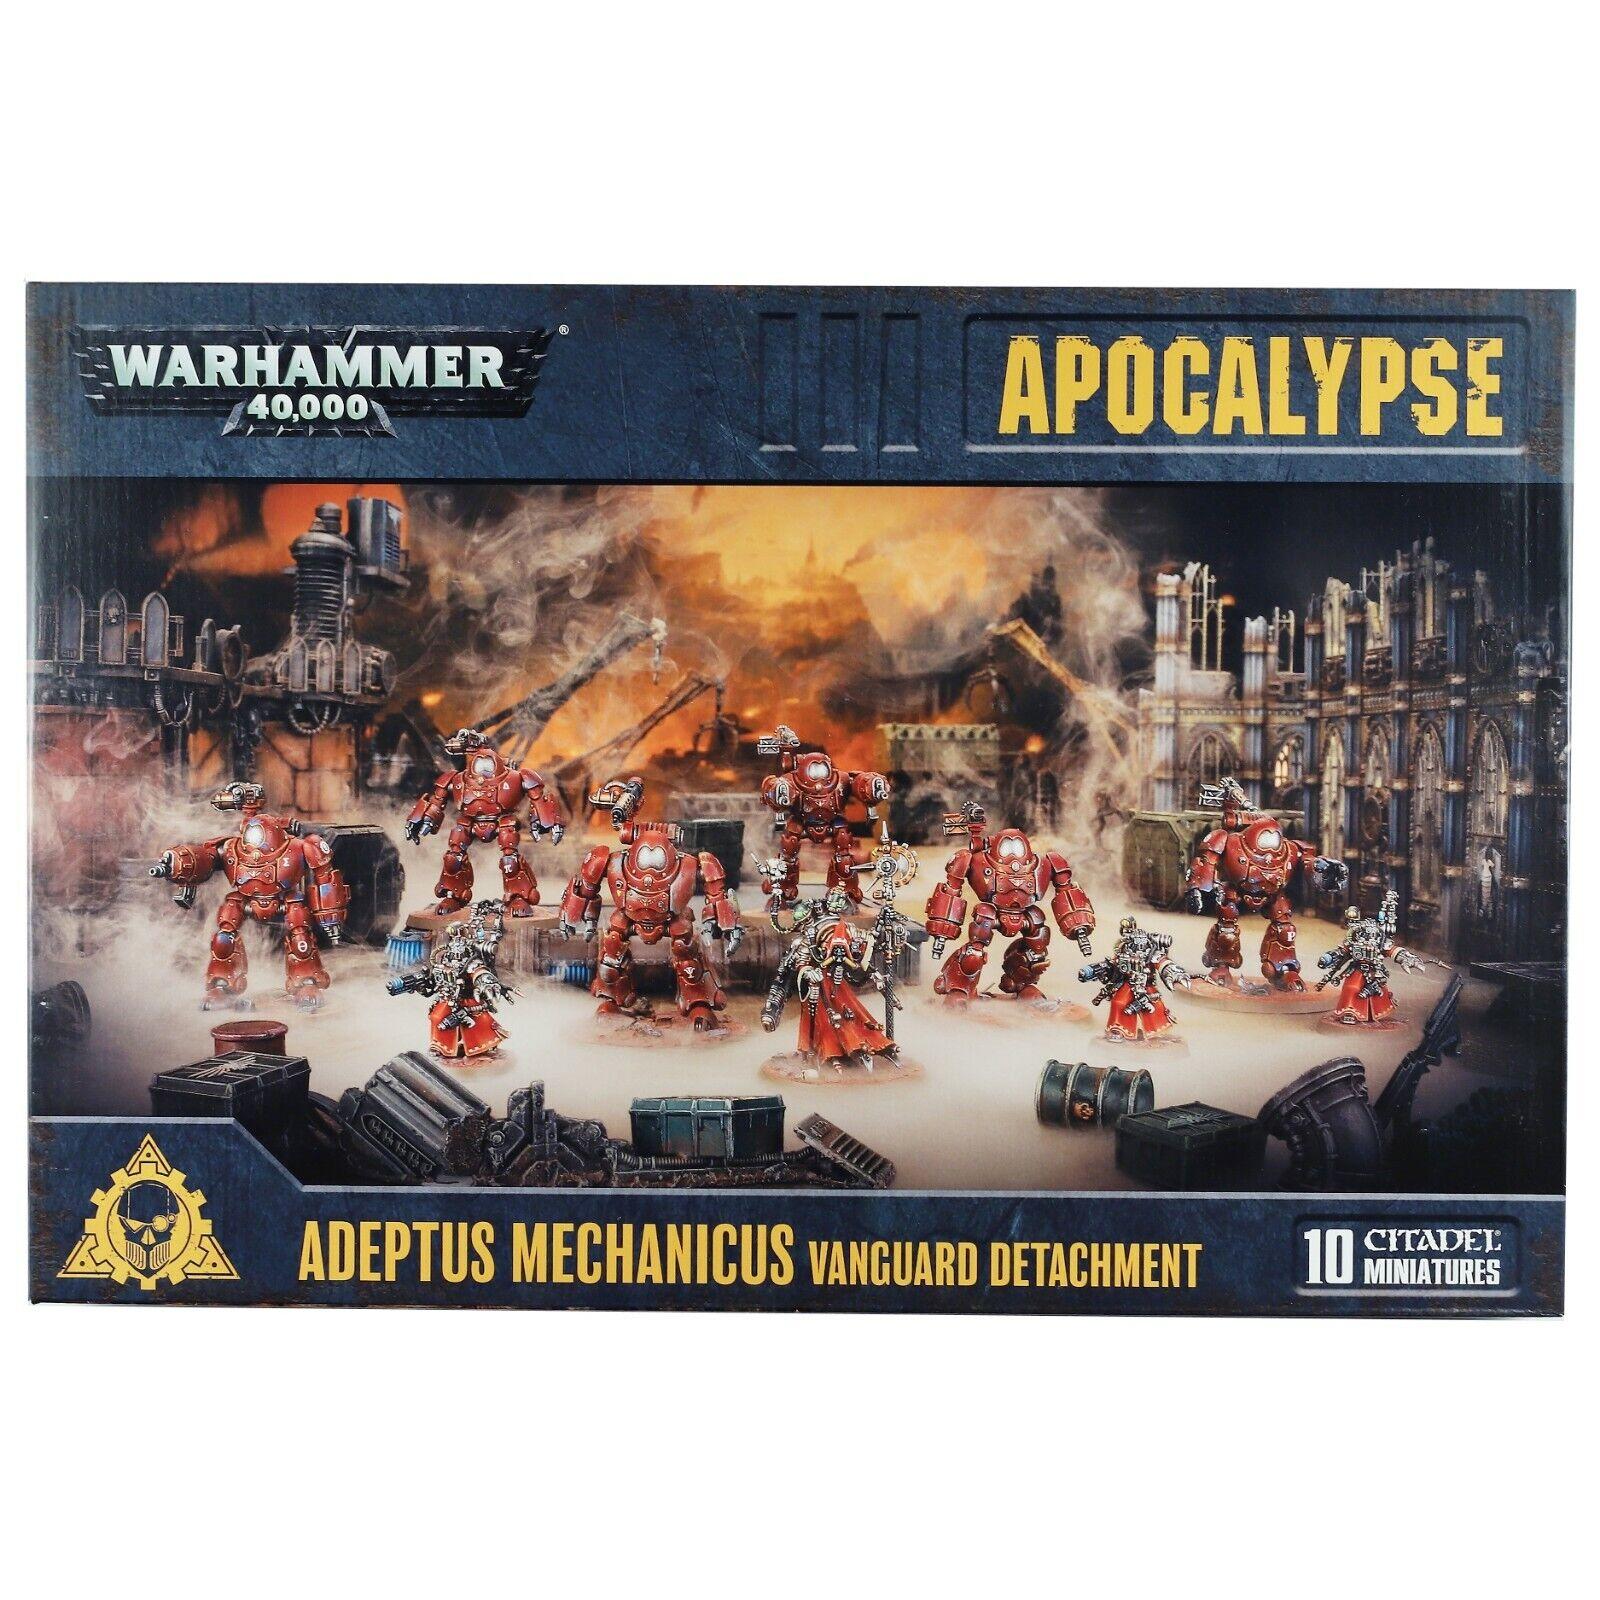 di moda Apocalypse Apocalypse Apocalypse Adeptus Mechanicus Vanguard Detachment Warhammer 40,000 (59-19)  colorways incredibili